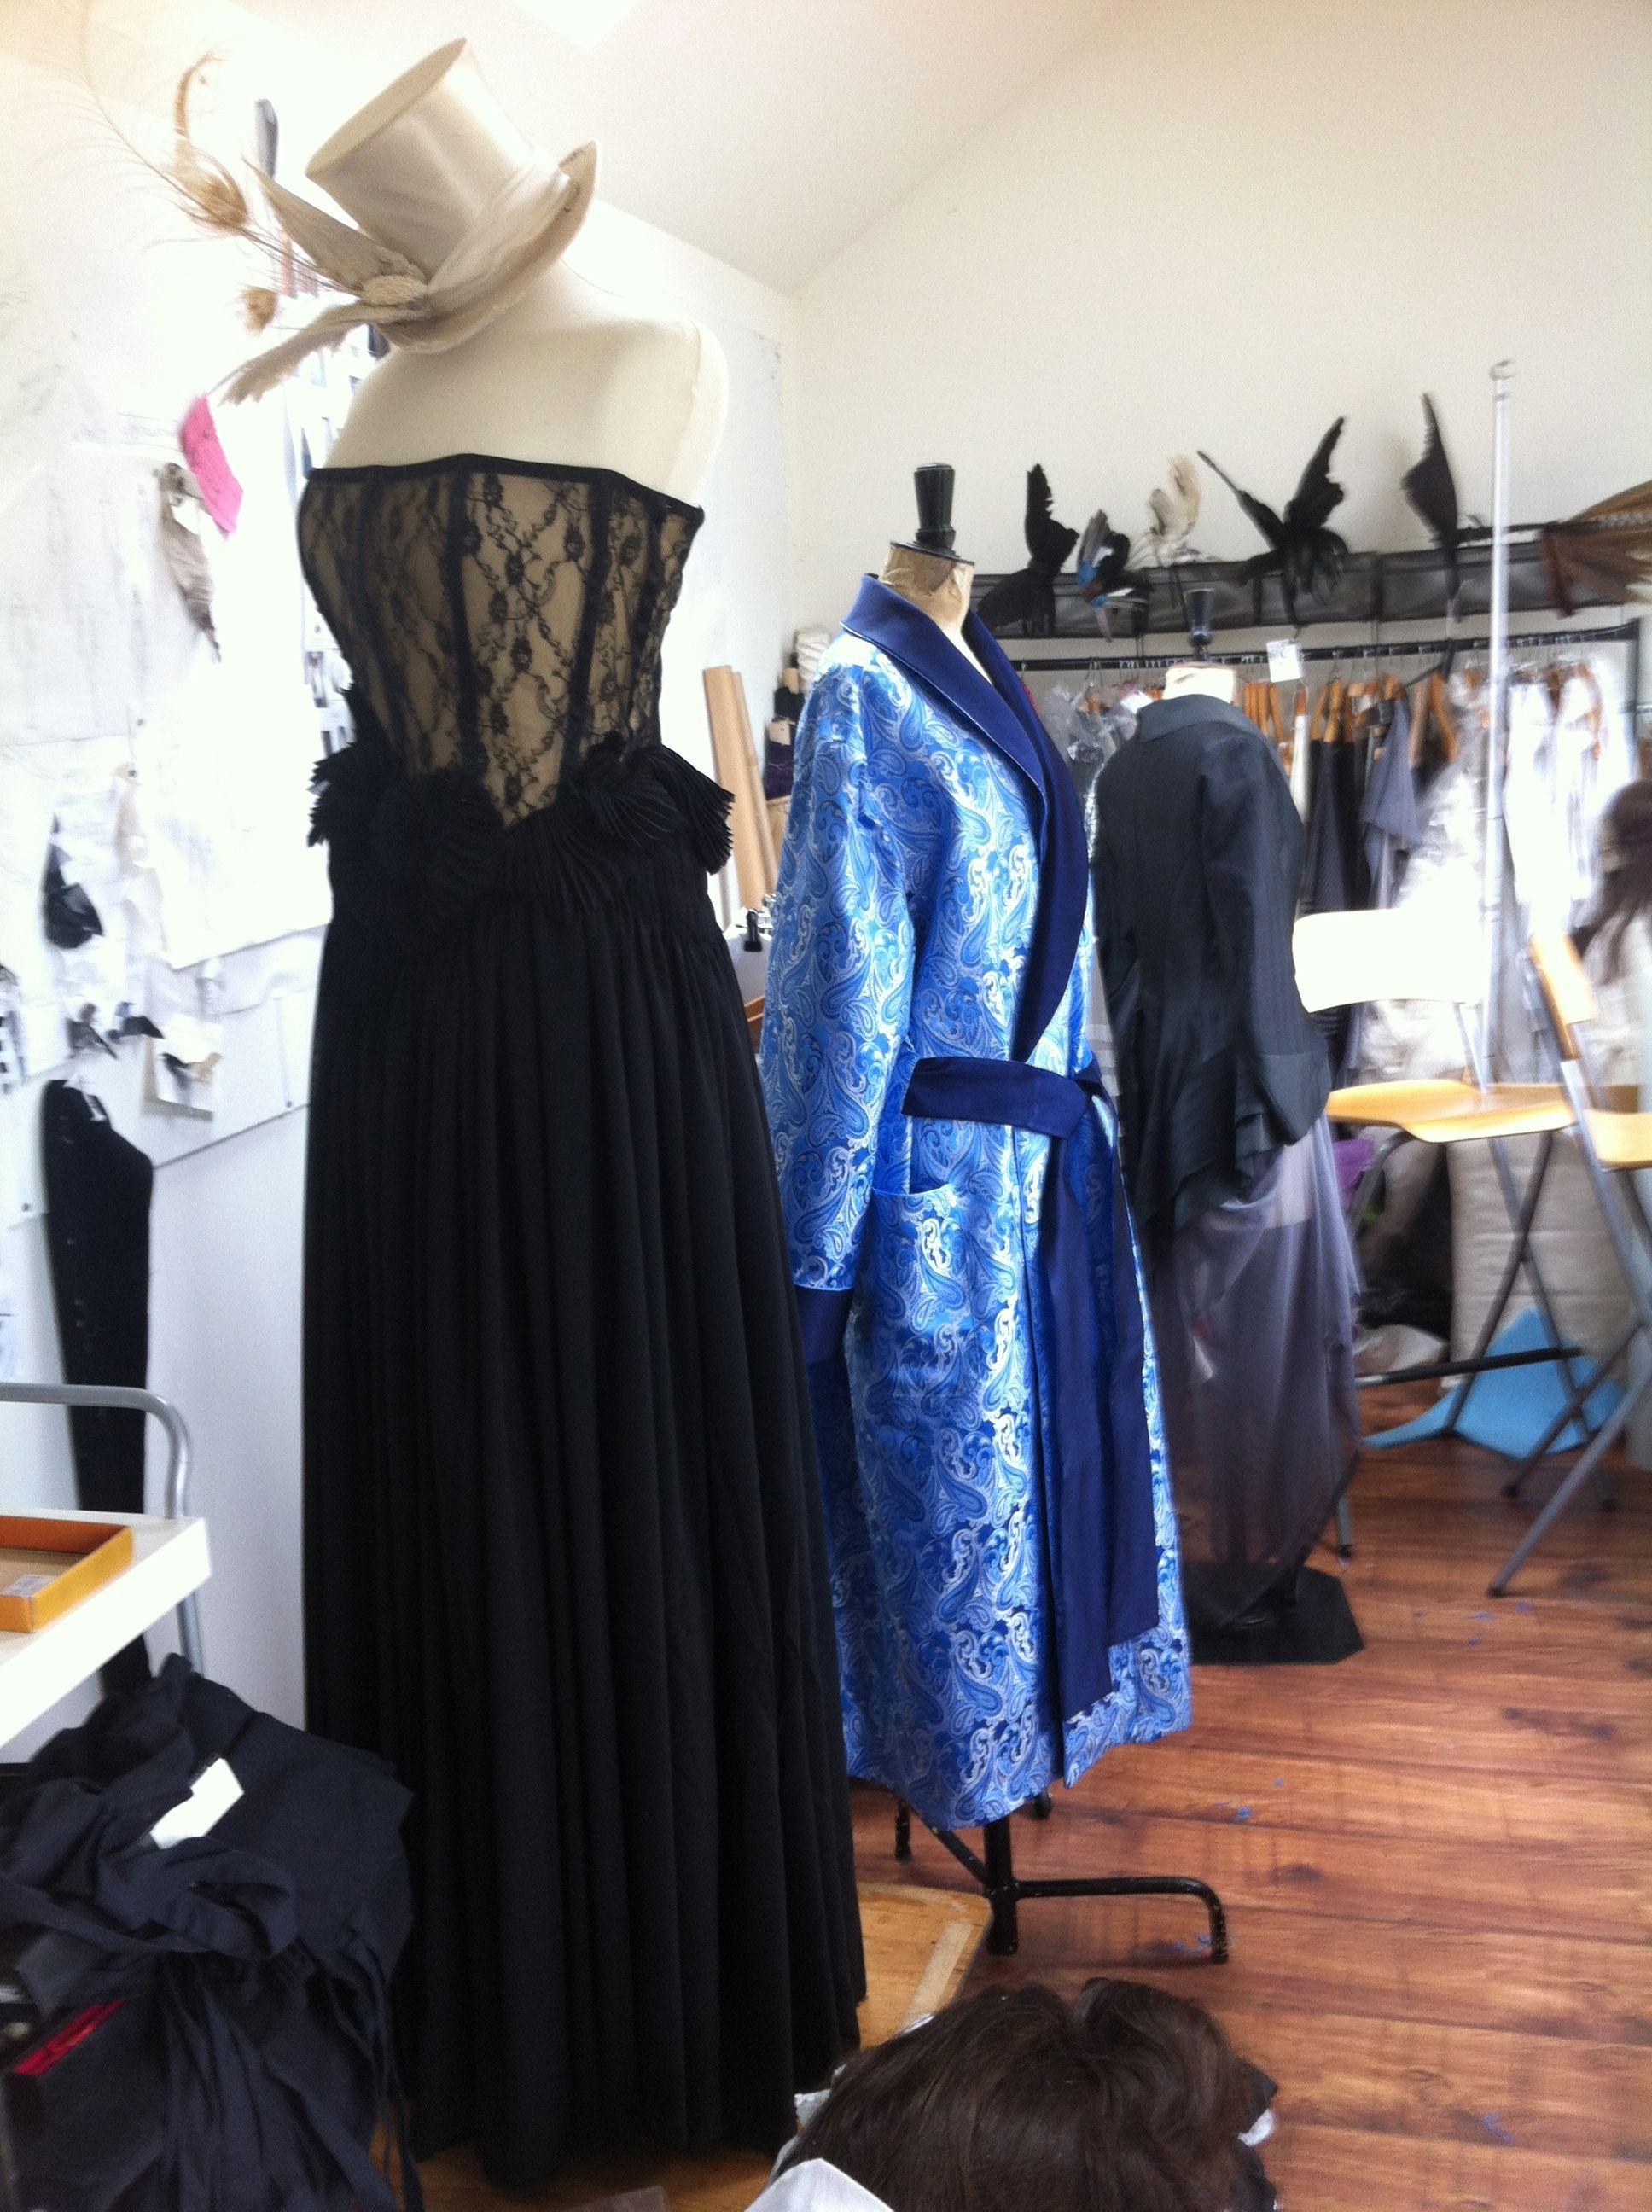 ab37d5e082 Bespoke Prom dress   bespoke uber-lush silk dressing gown.  www.annebarclay.com